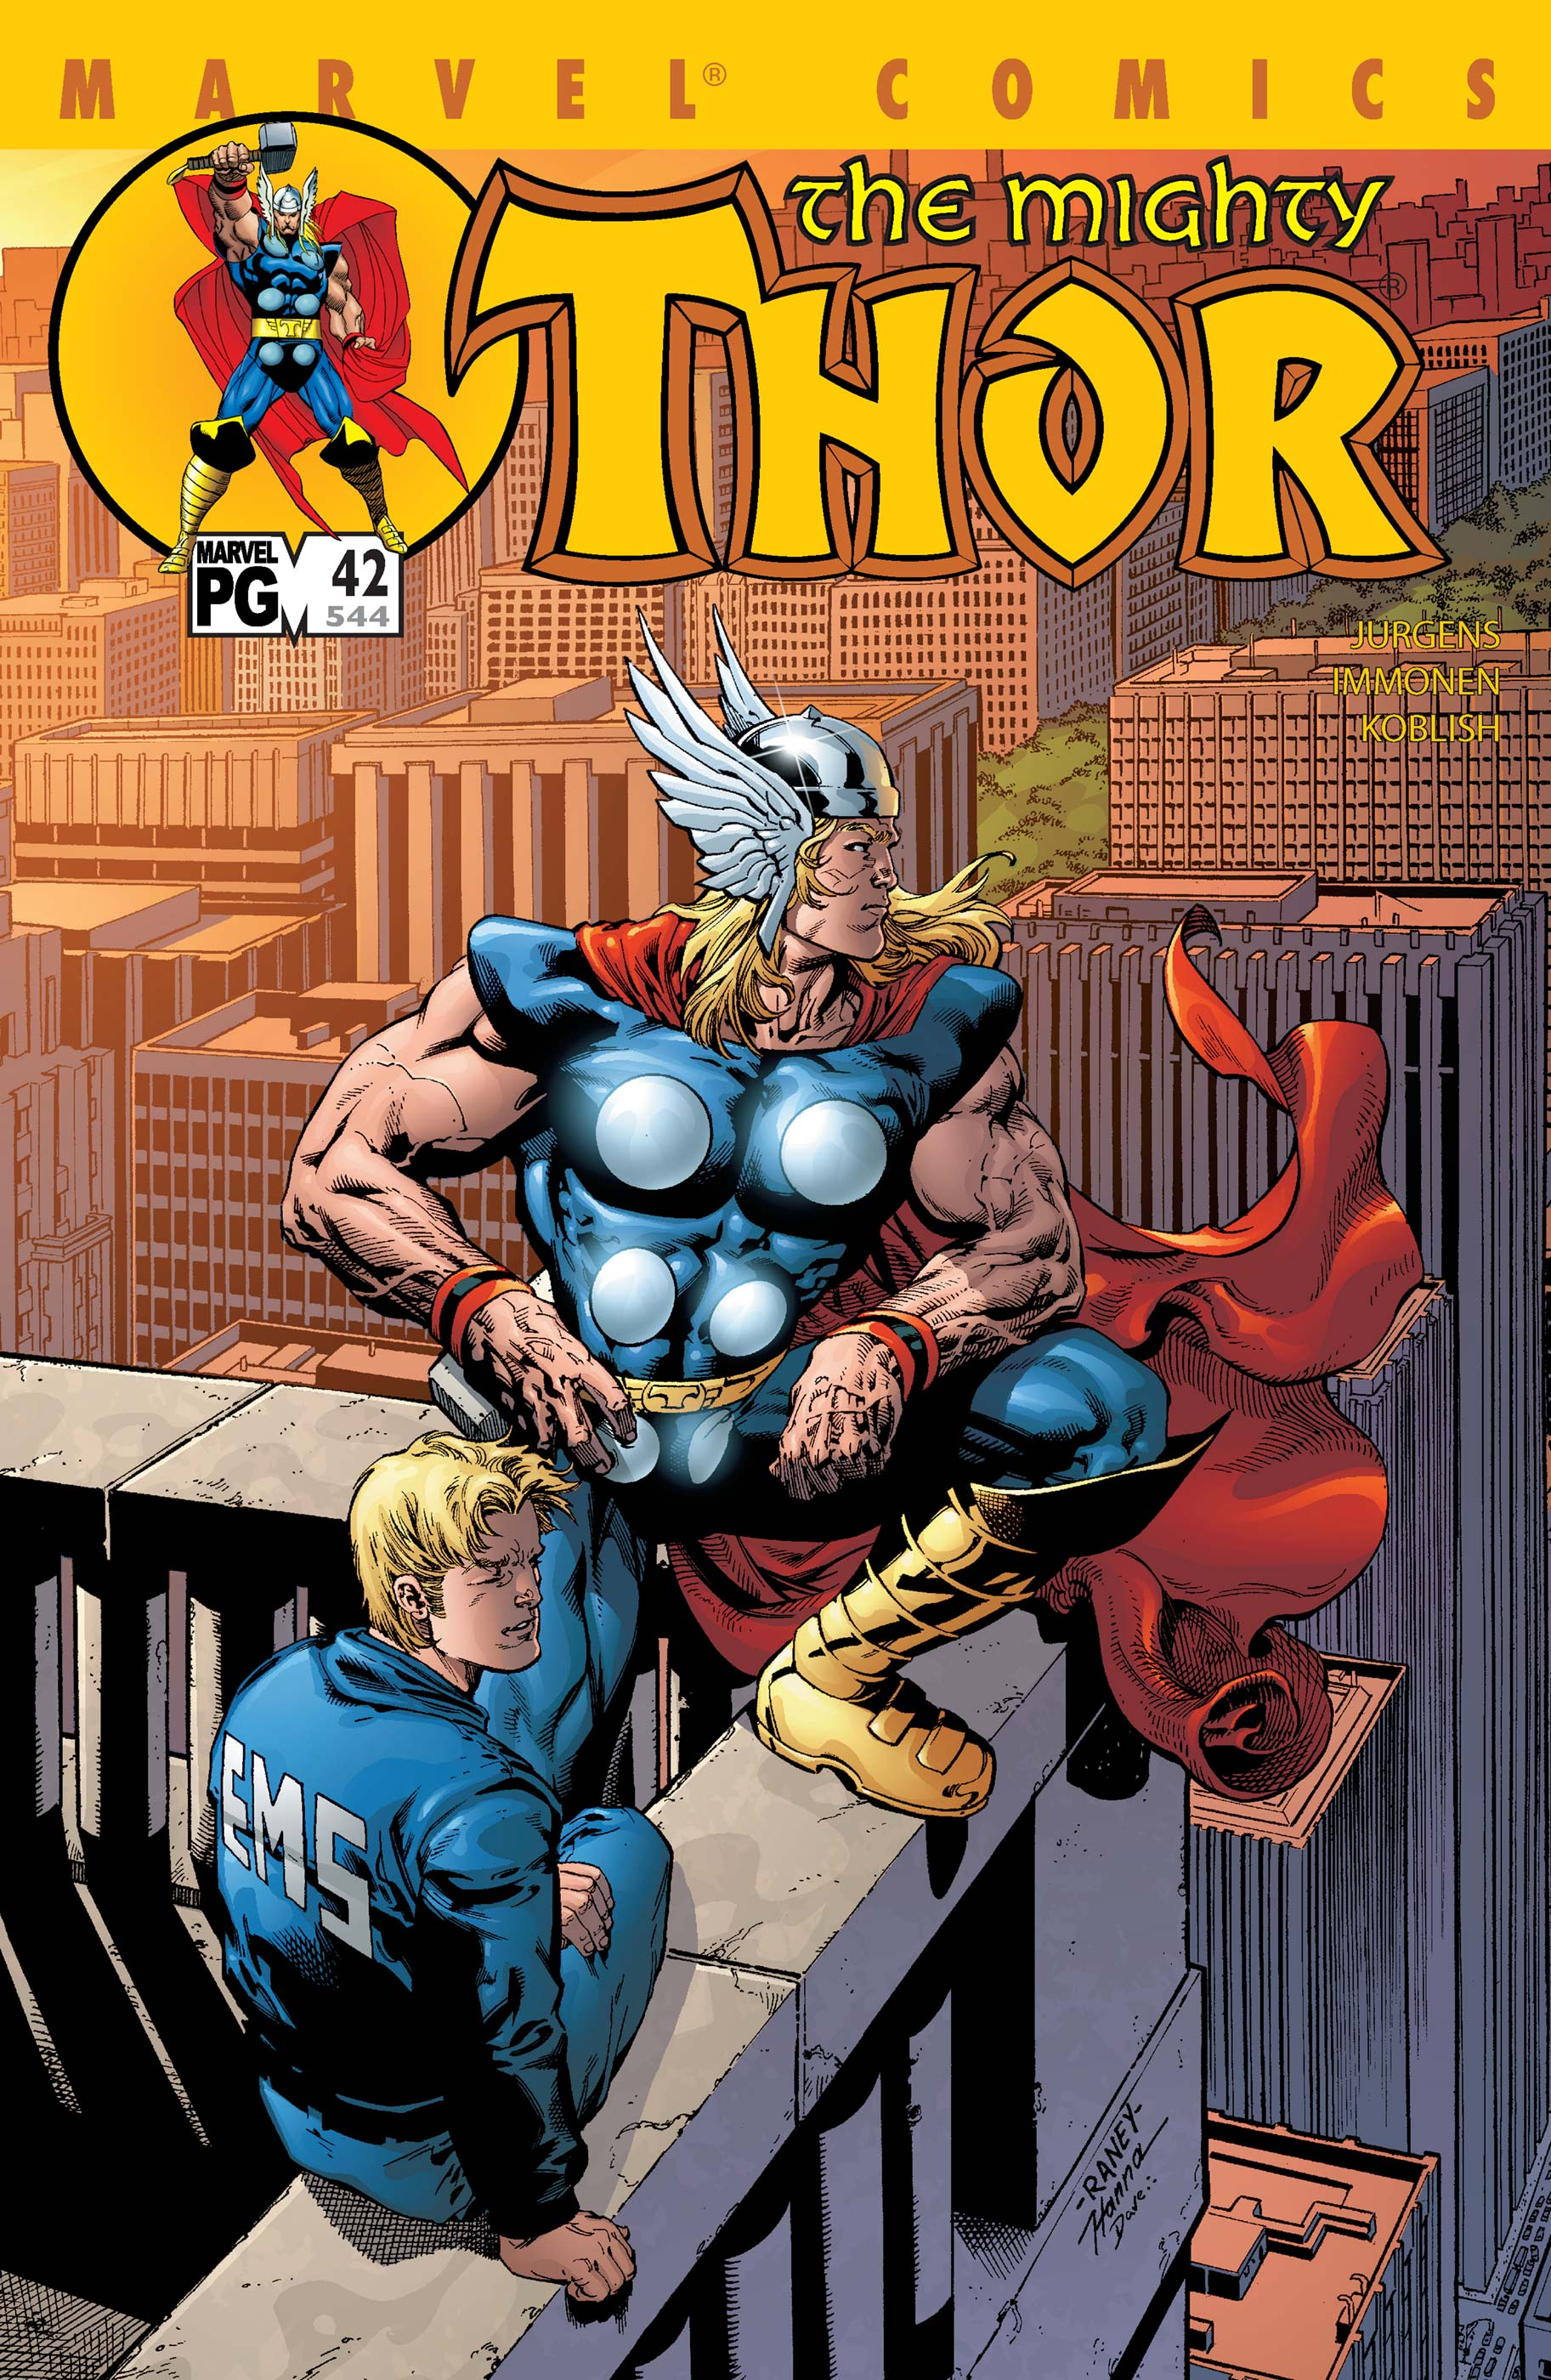 Thor (1998) #42